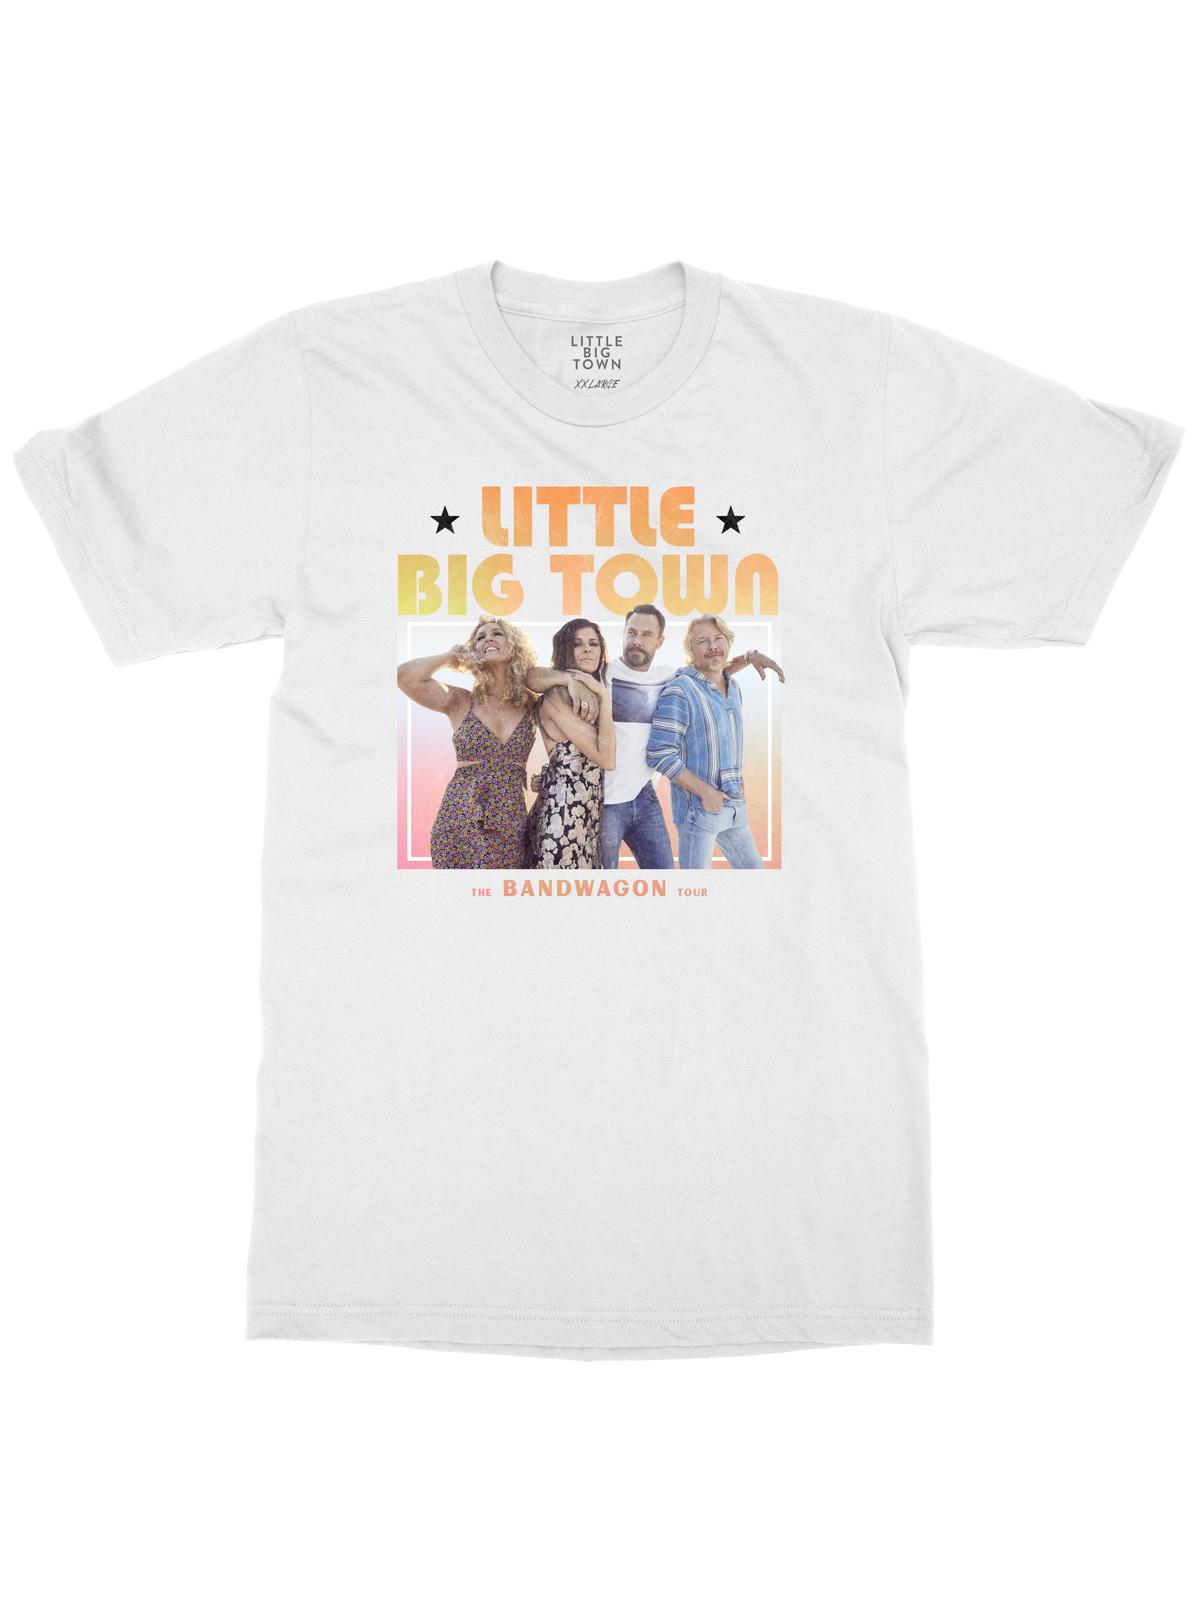 Bandwagon Tour White Dateback T-shirt